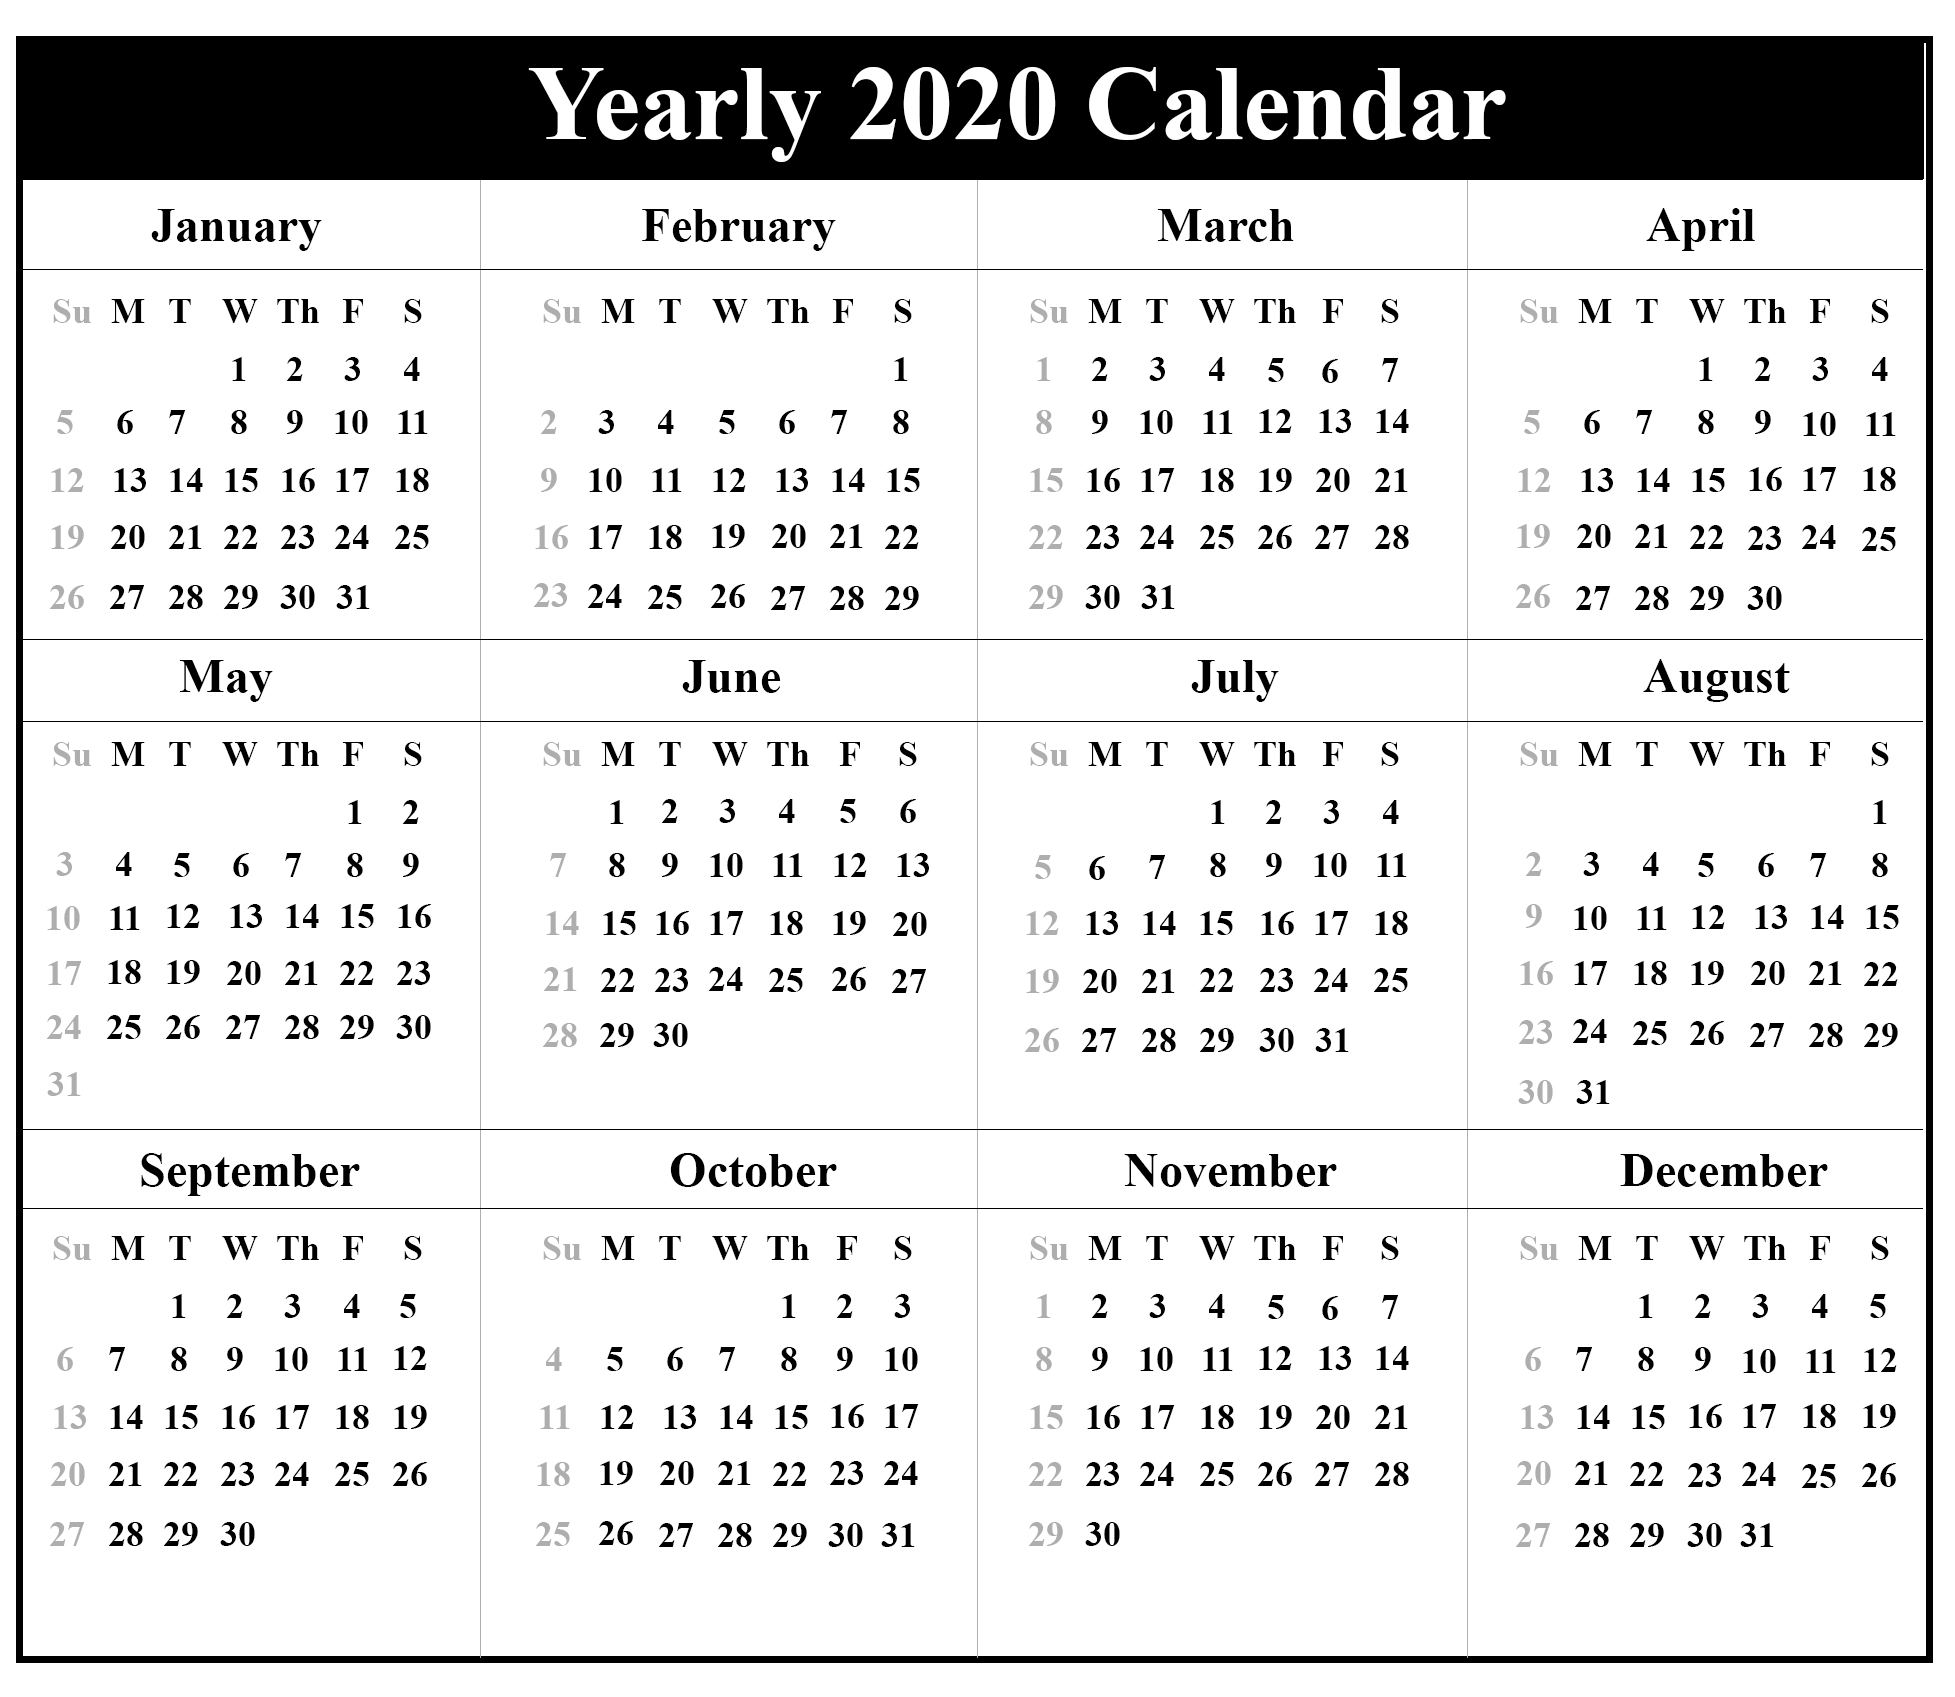 2020 2020 Calendar Australia - Remar-Financial Calendar Template Australia 2020-2020